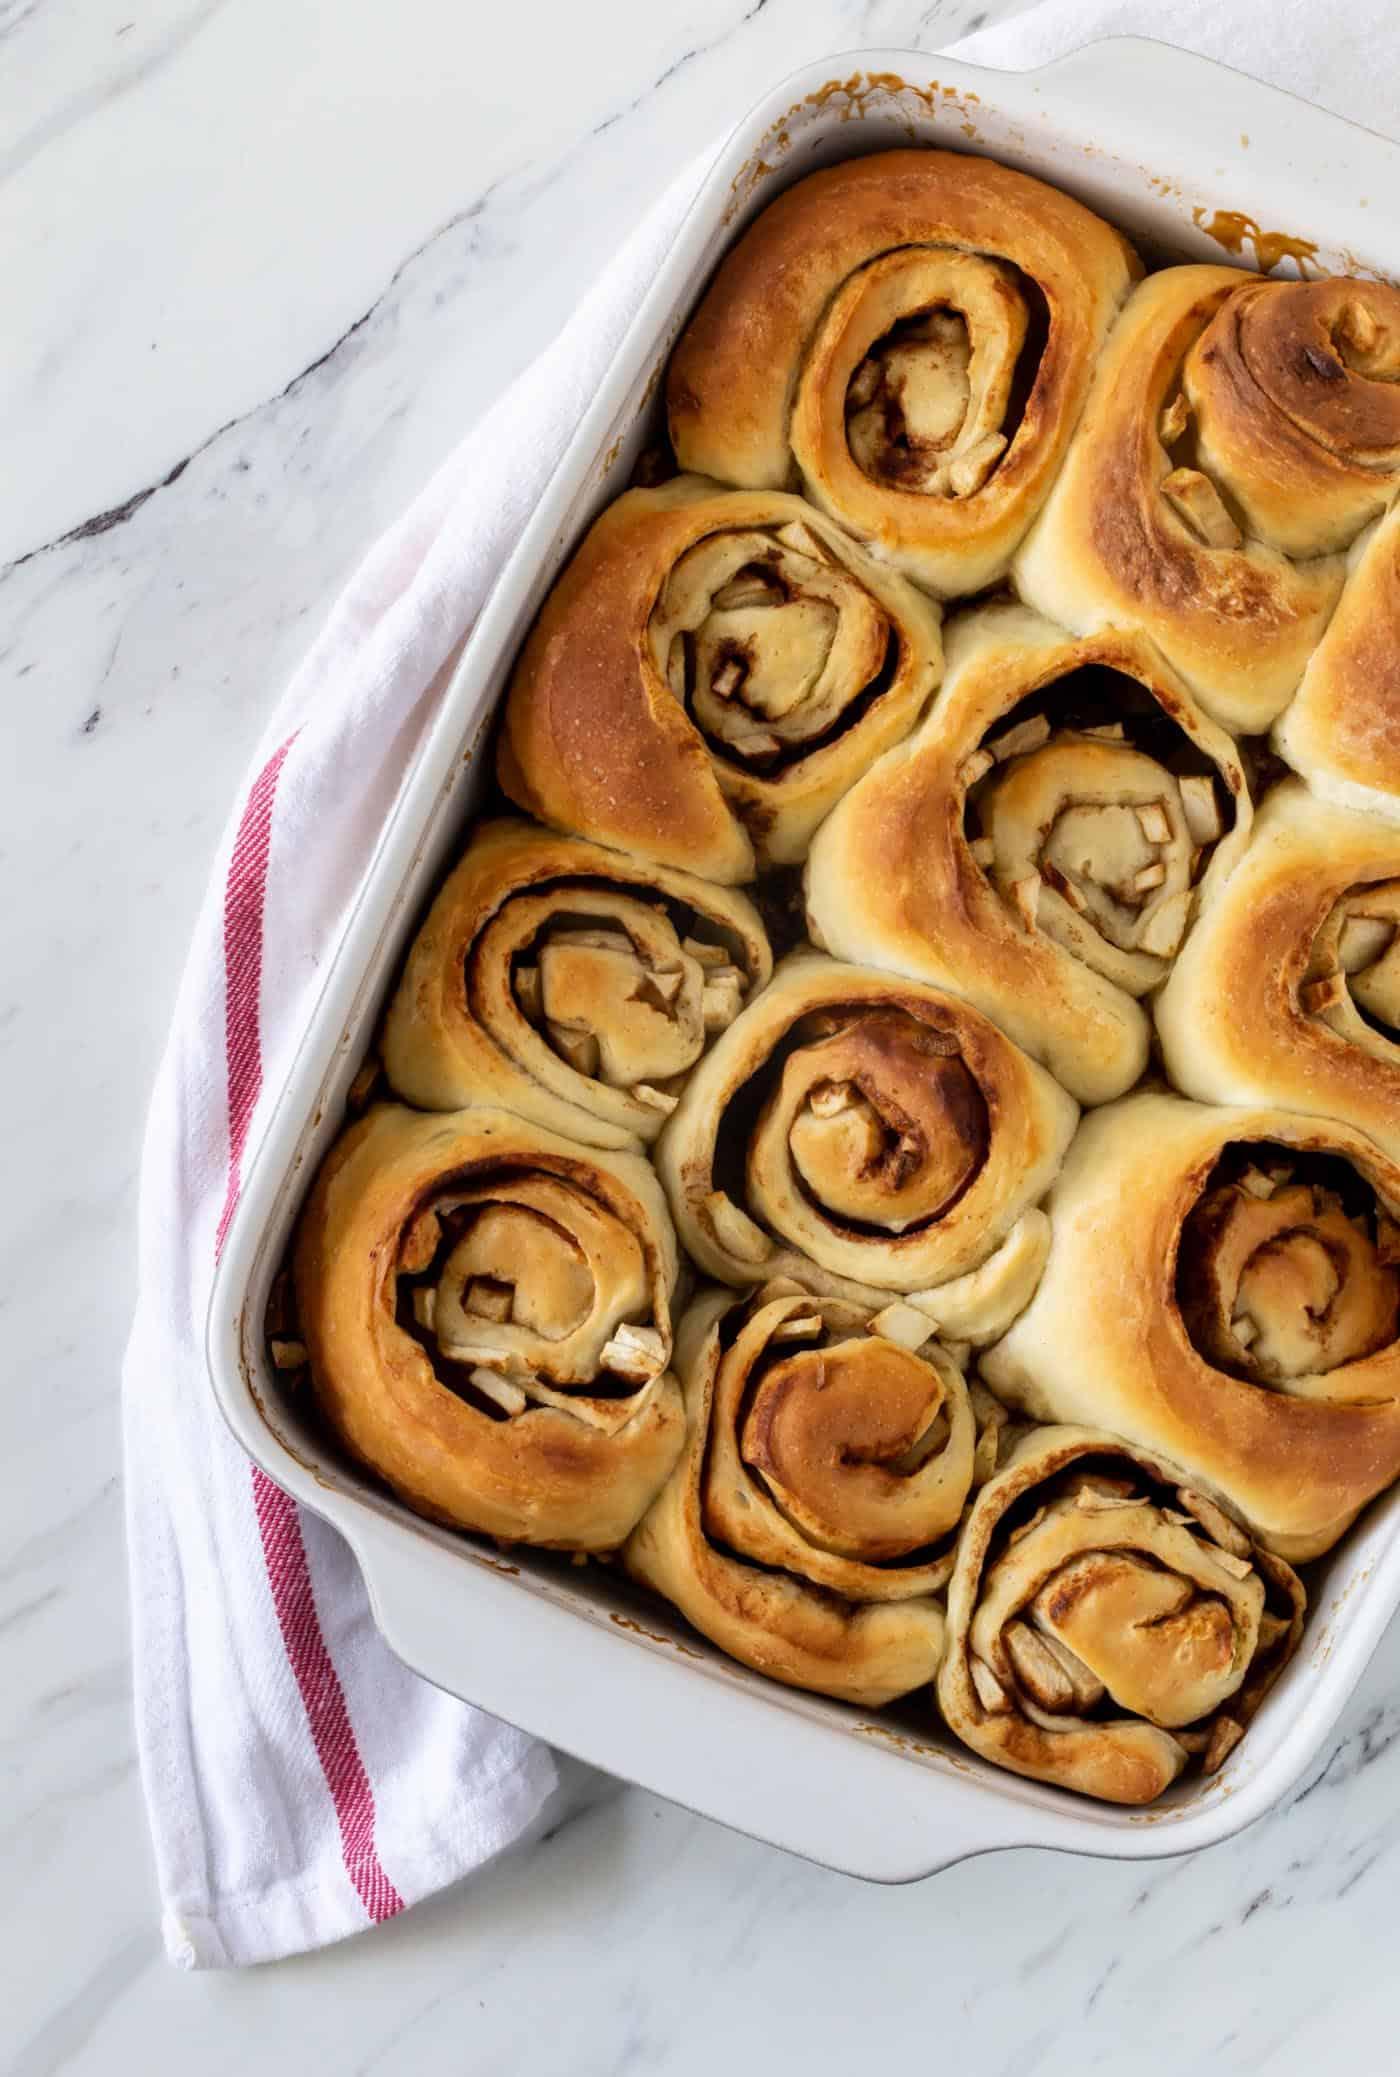 Caramel apple rolls in white baking dish.